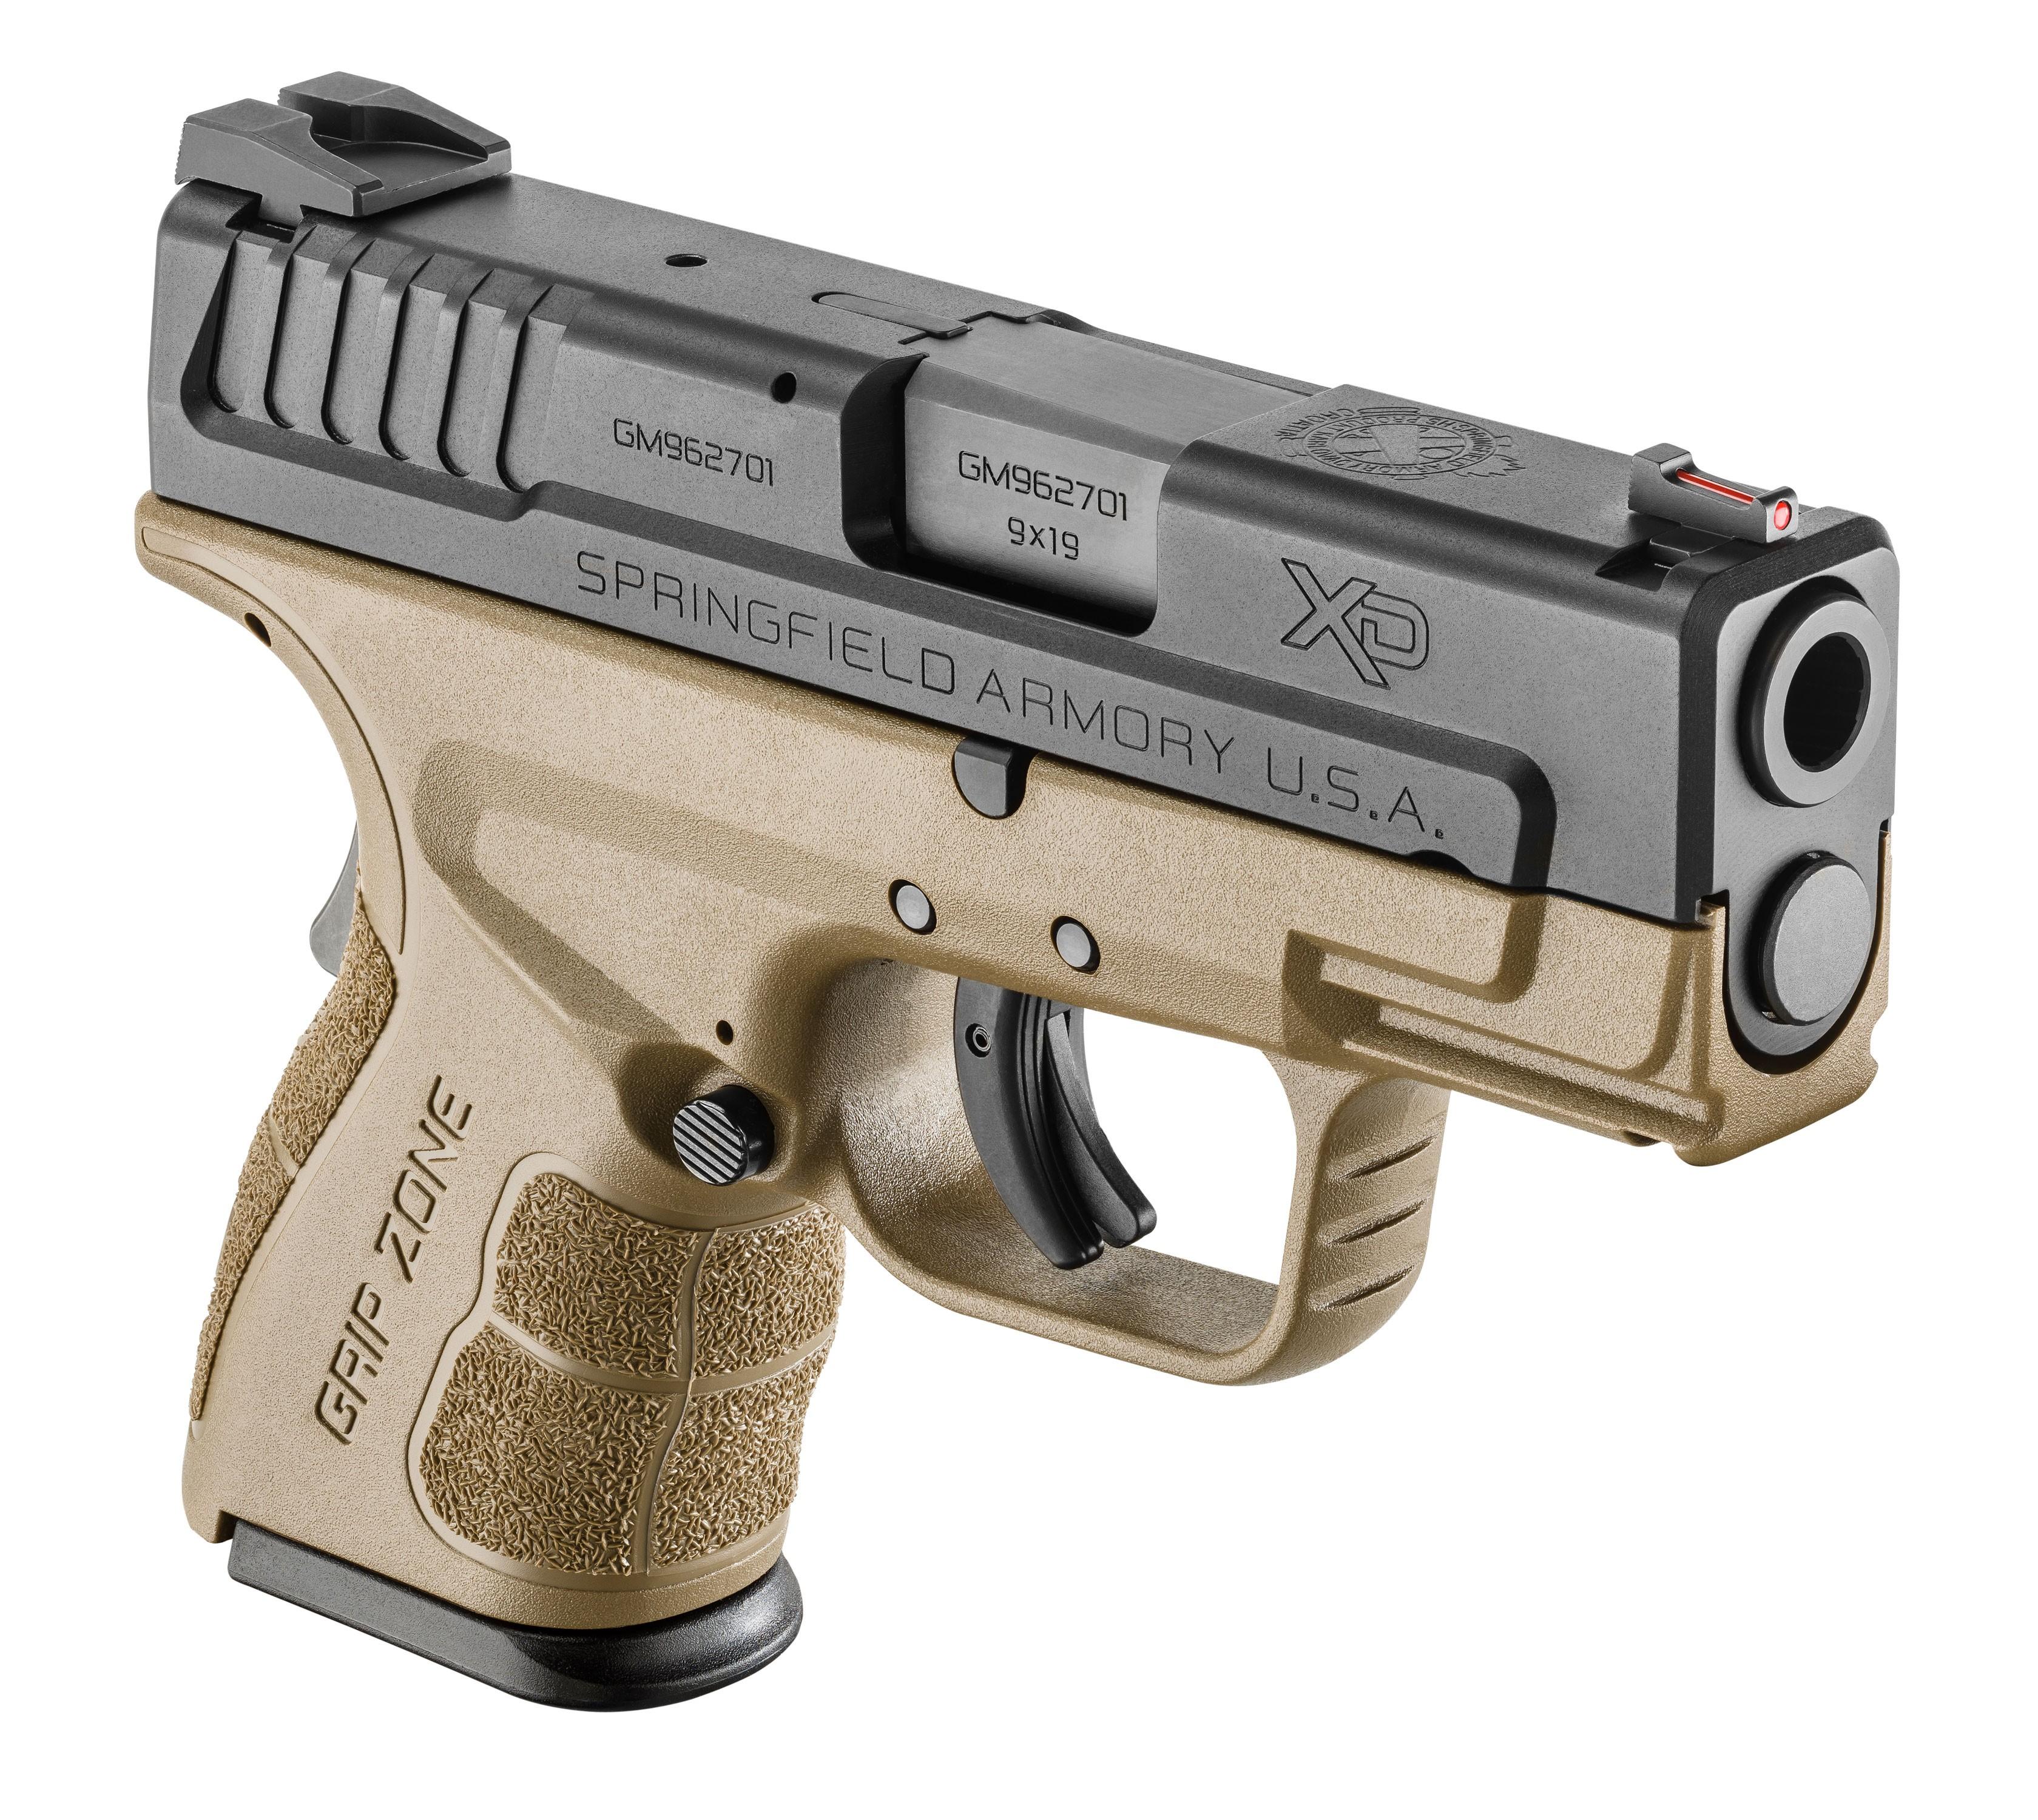 Springfield XDG9801FDEHC XD Mod 2 Sub Compact 9mm Pistol